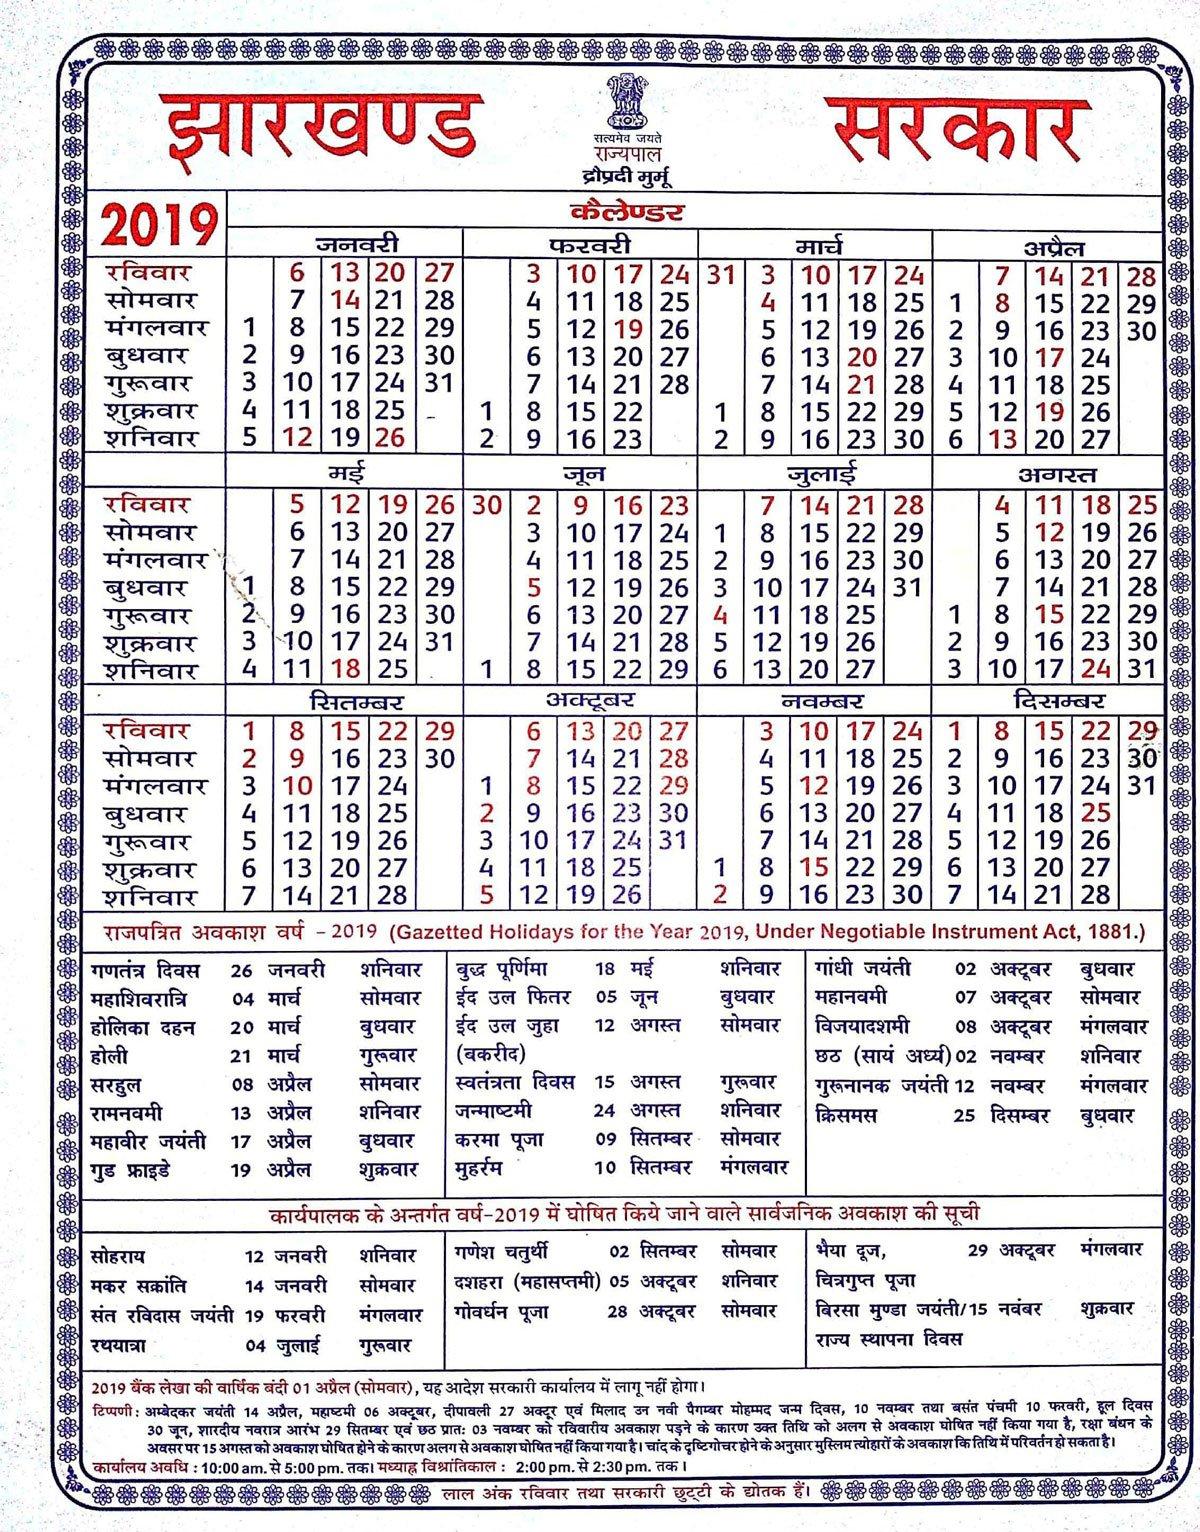 Jharkhand Govt Calendar – Free Business Listing, Free Business Calendar 2019 Government Holidays